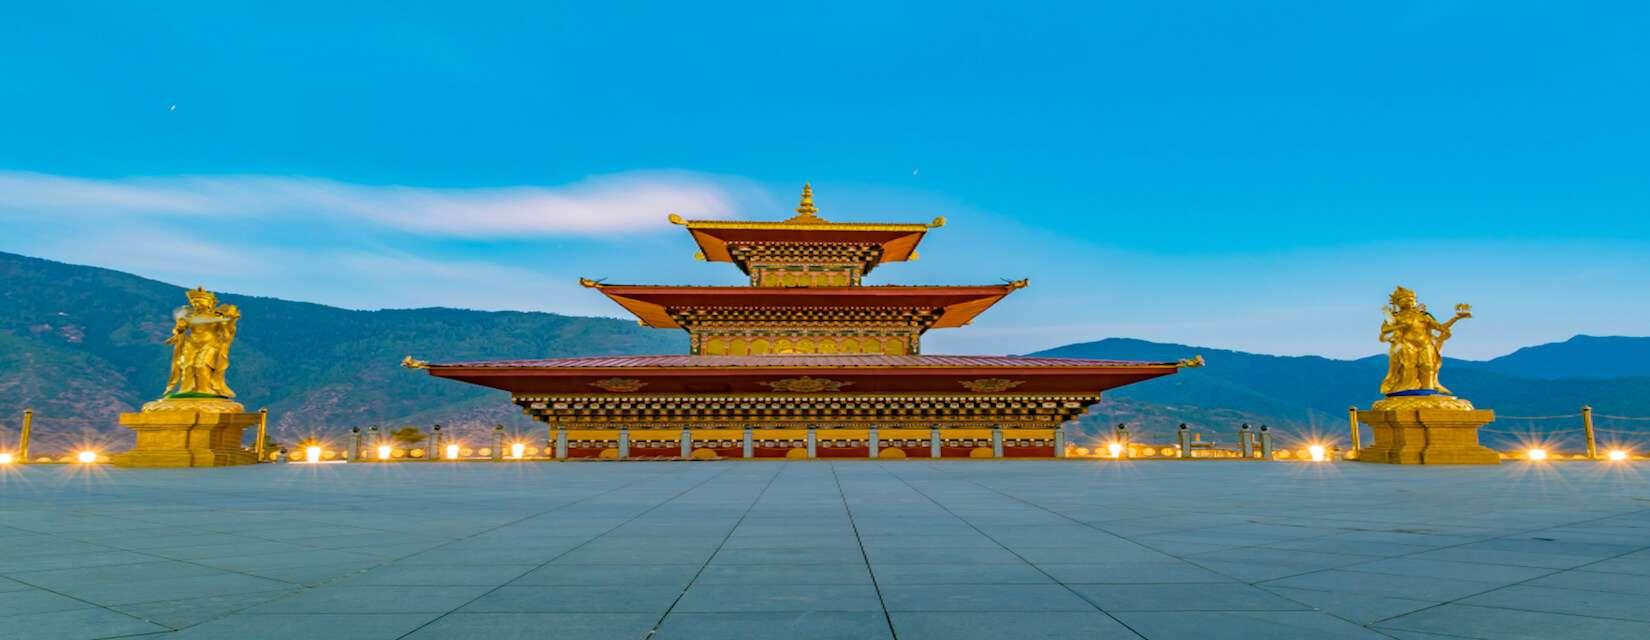 Bhutan tours - Himalayan Frozen Adventure